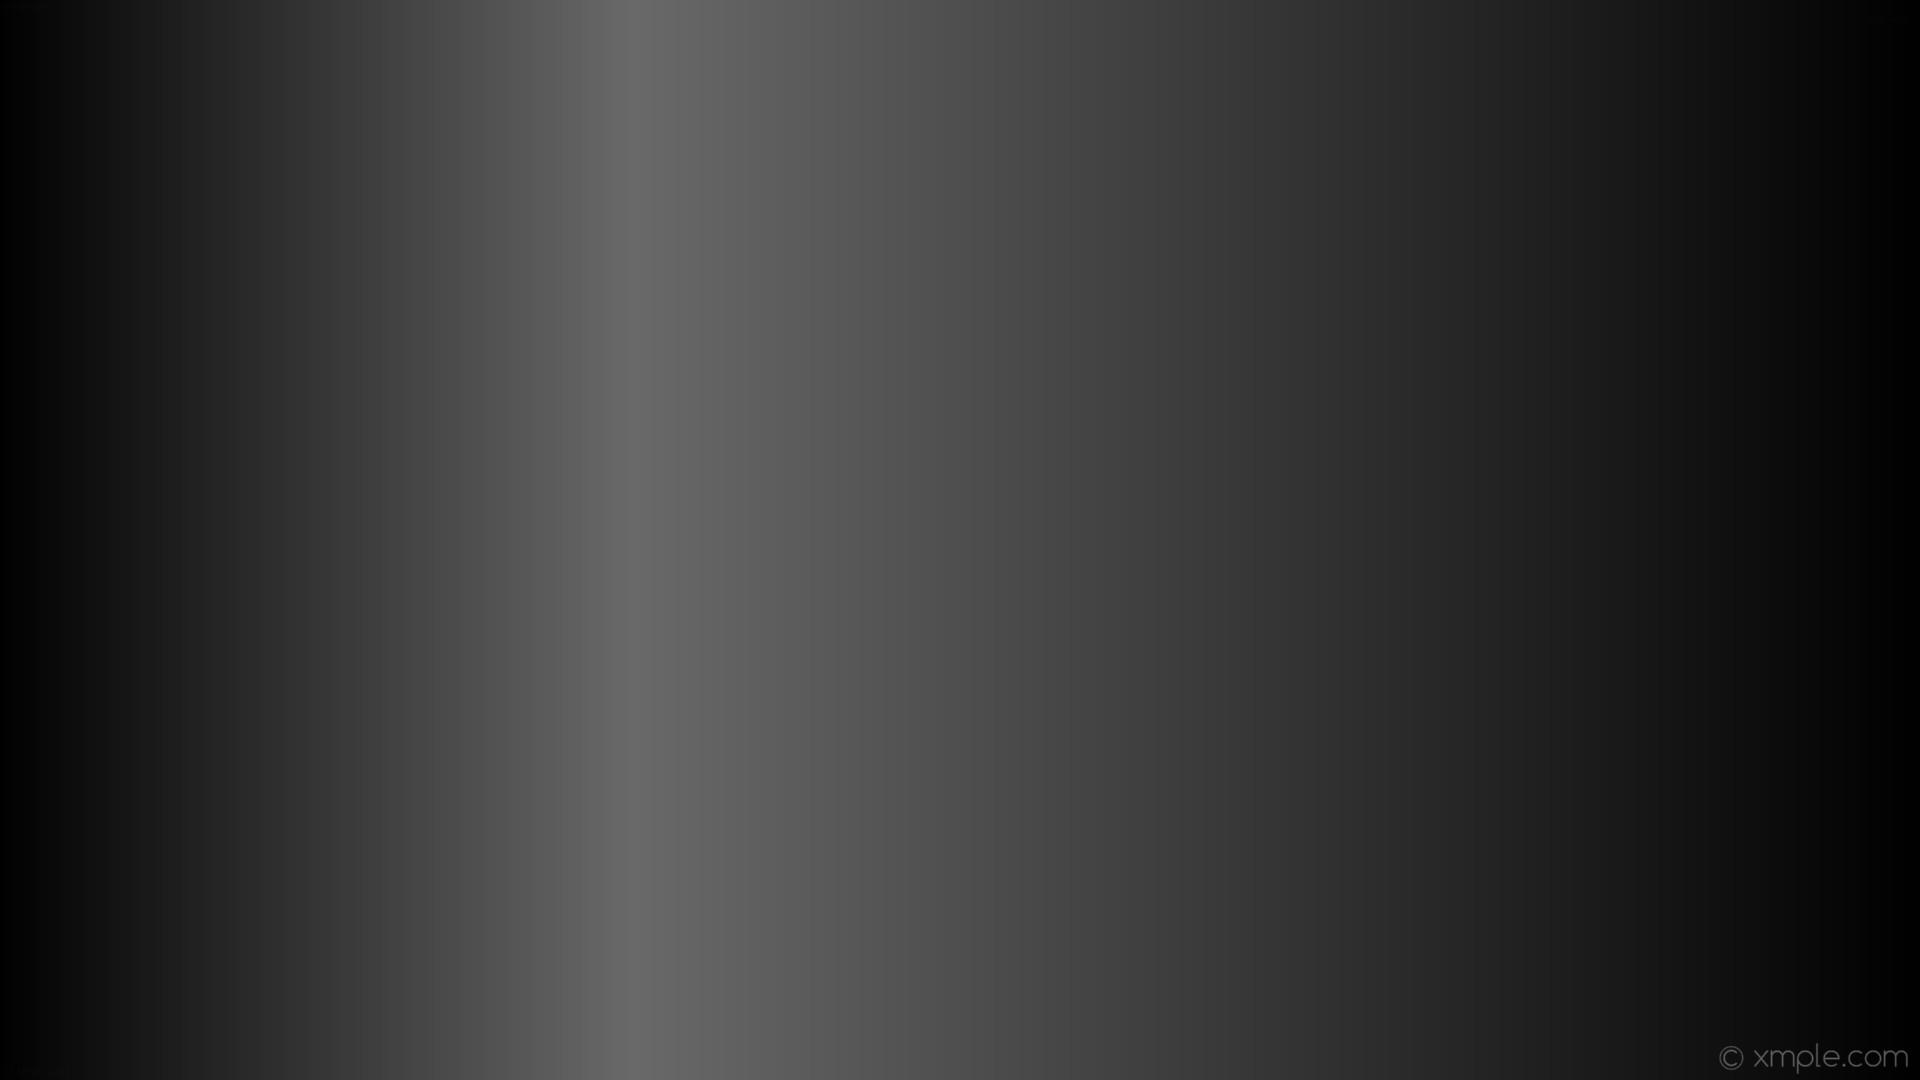 wallpaper grey highlight black gradient linear dim gray #000000 #696969 0°  67%